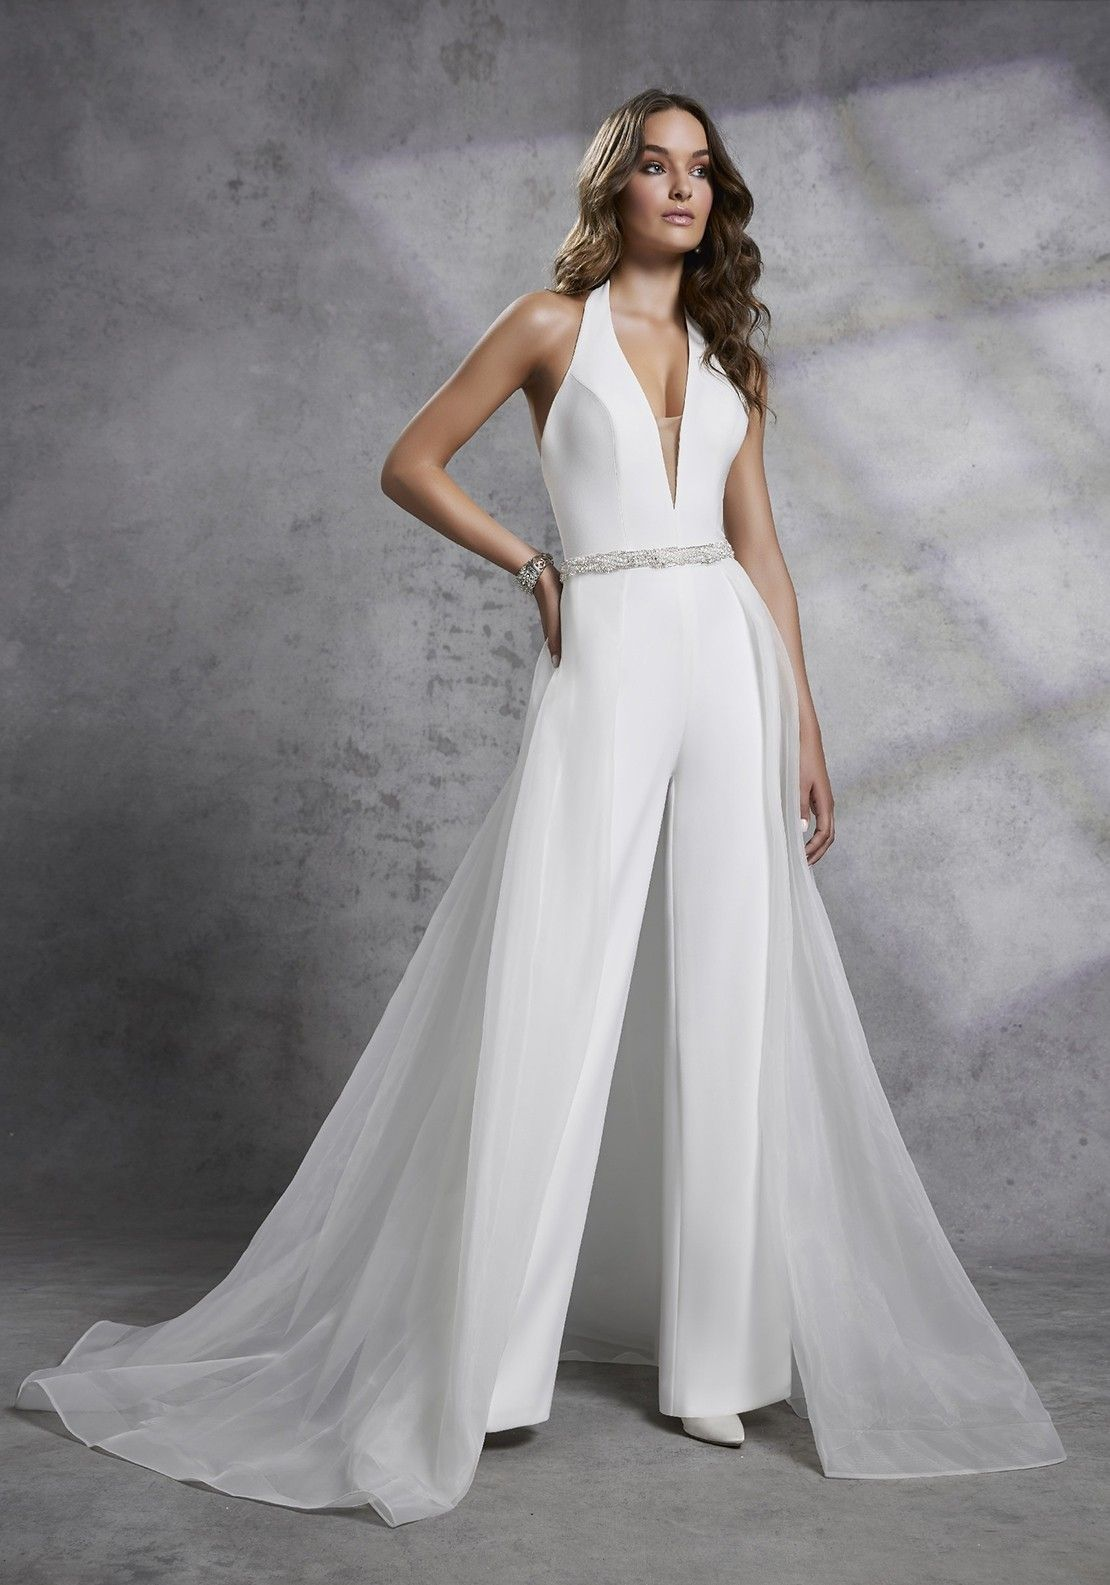 79abd5a022 Mori Lee Bridal, Wedding Jumpsuit, Victoria Dress, Victoria Wedding,  Trouser Suits,